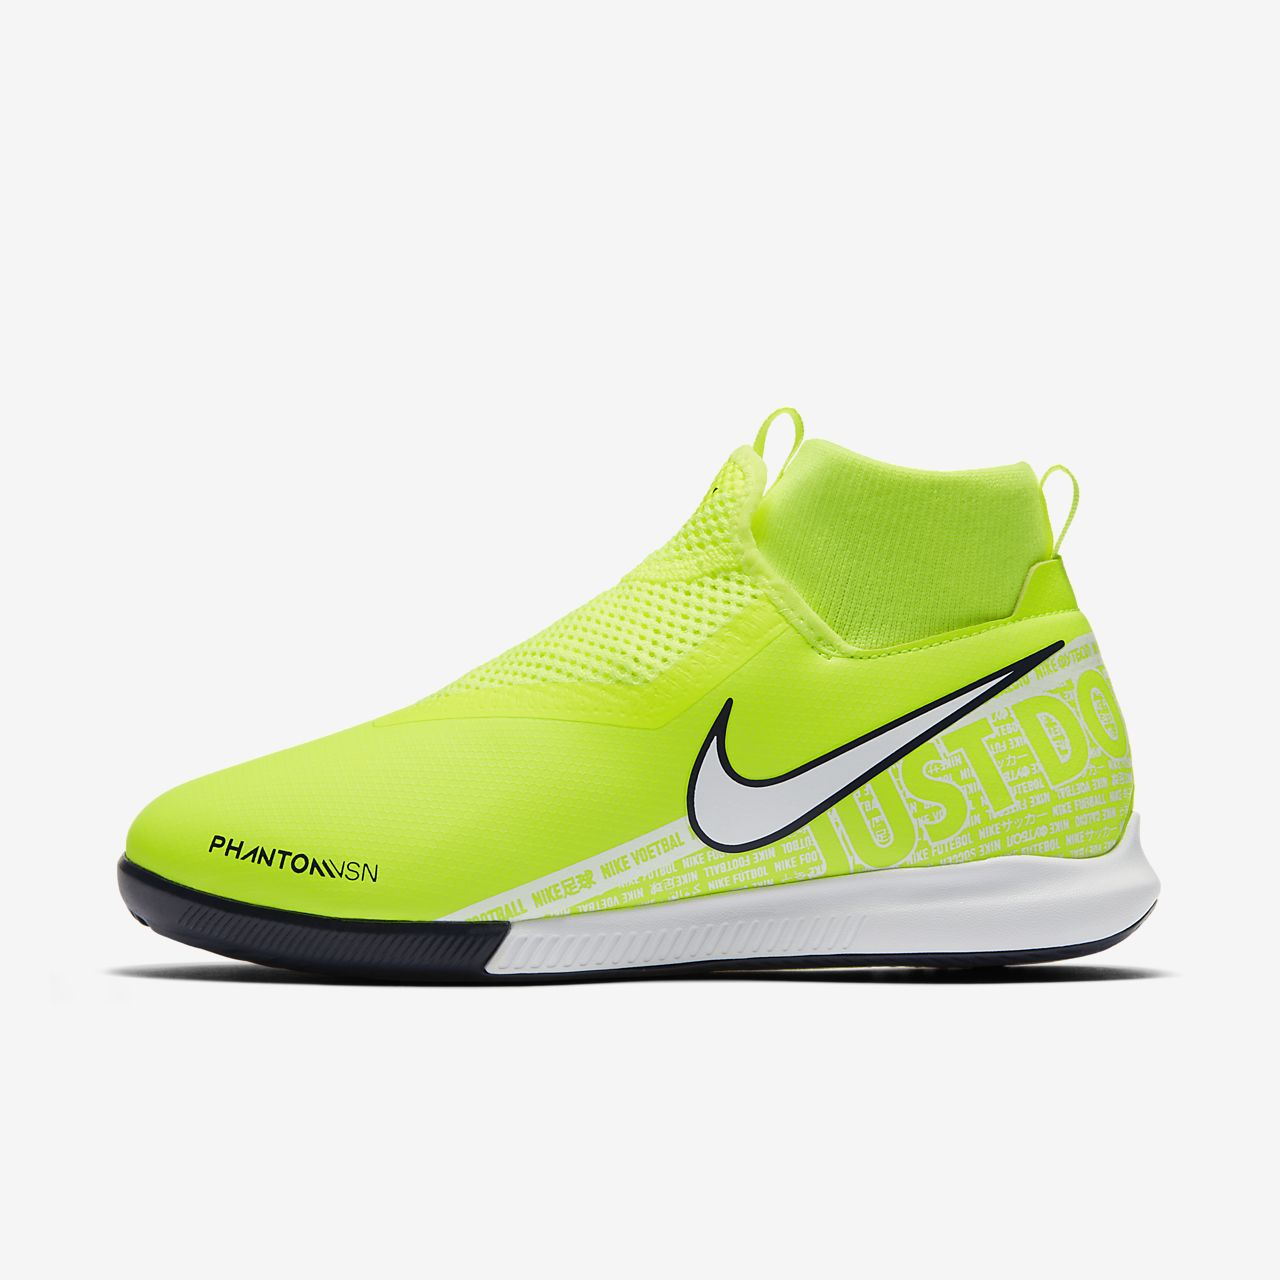 Nike Jr. Phantom Vision Academy Dynamic Fit IC Botas de fútbol sala - Niño/a